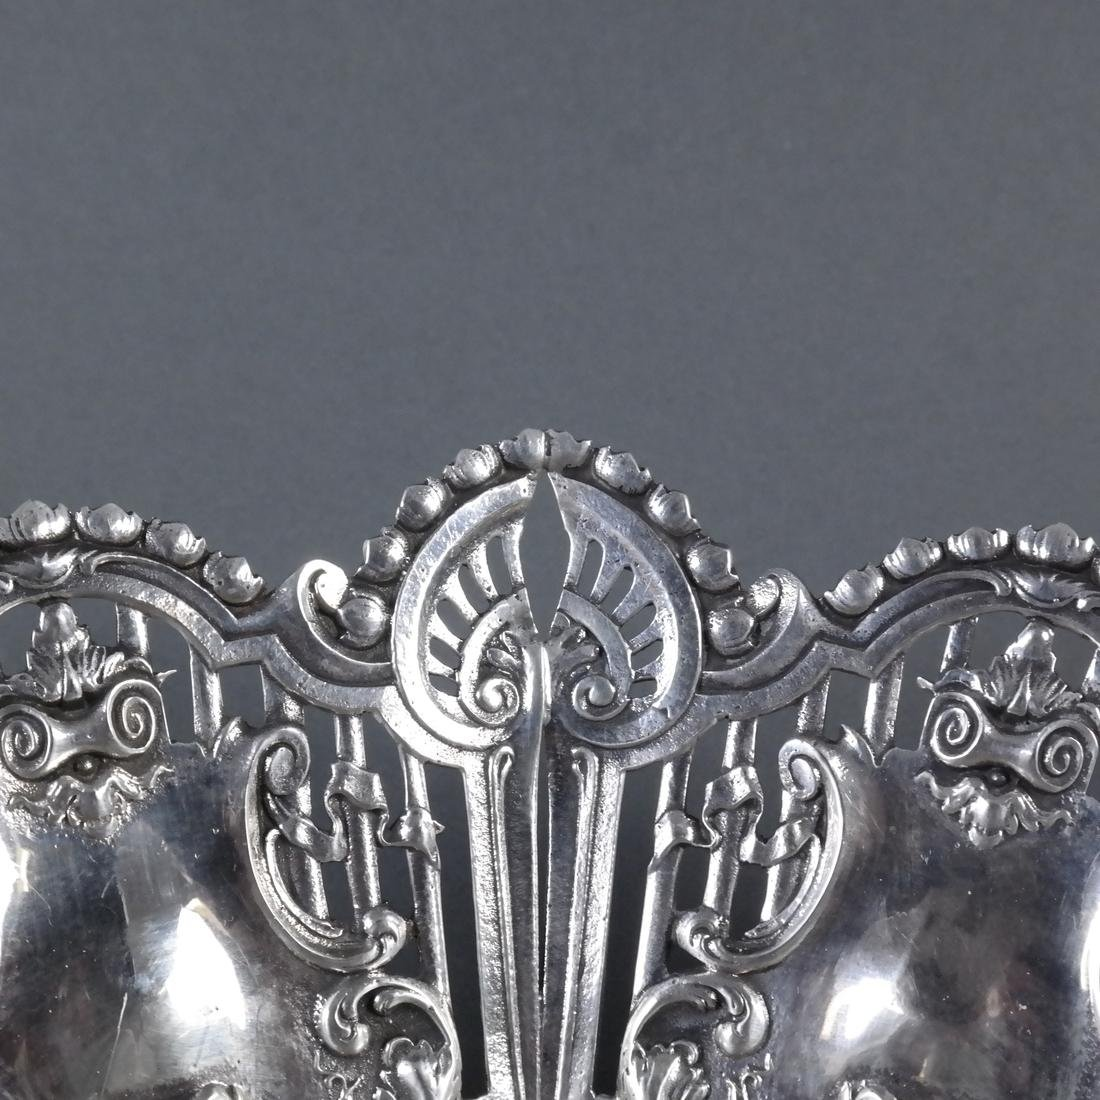 .900 Standard Silver Ornate Centerpiece - 5